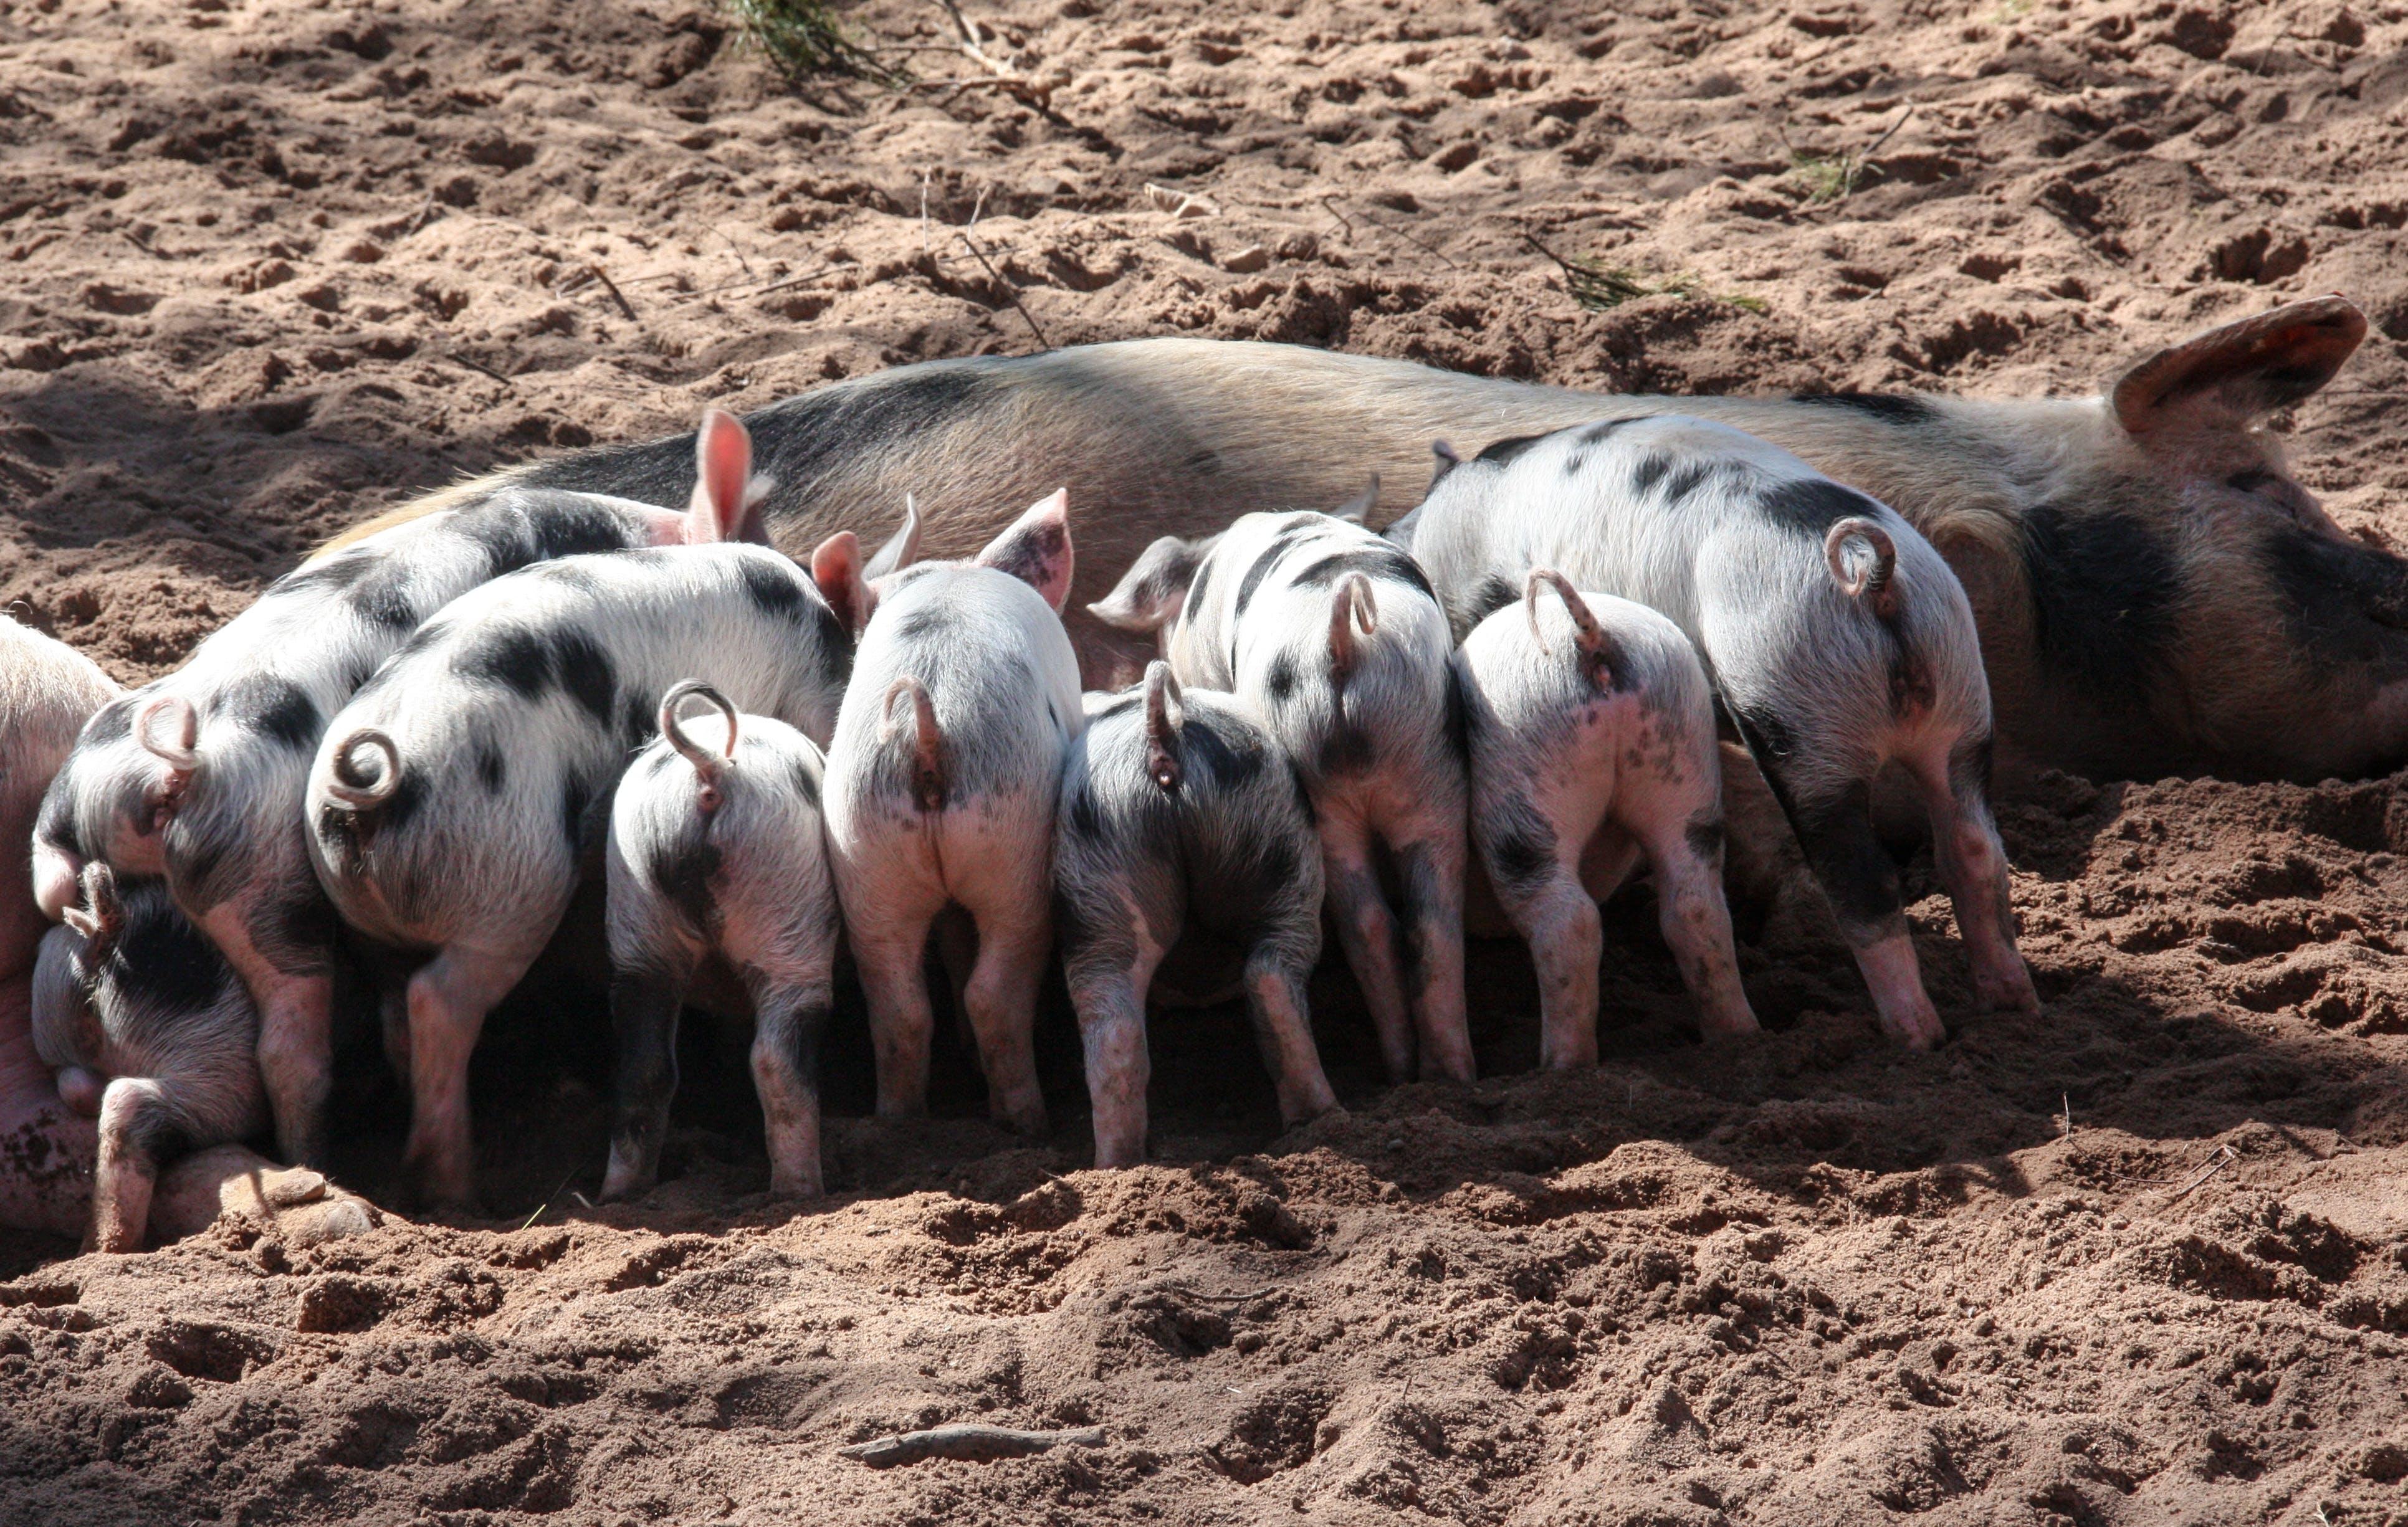 Black and White Pig Feeding Her Piglets